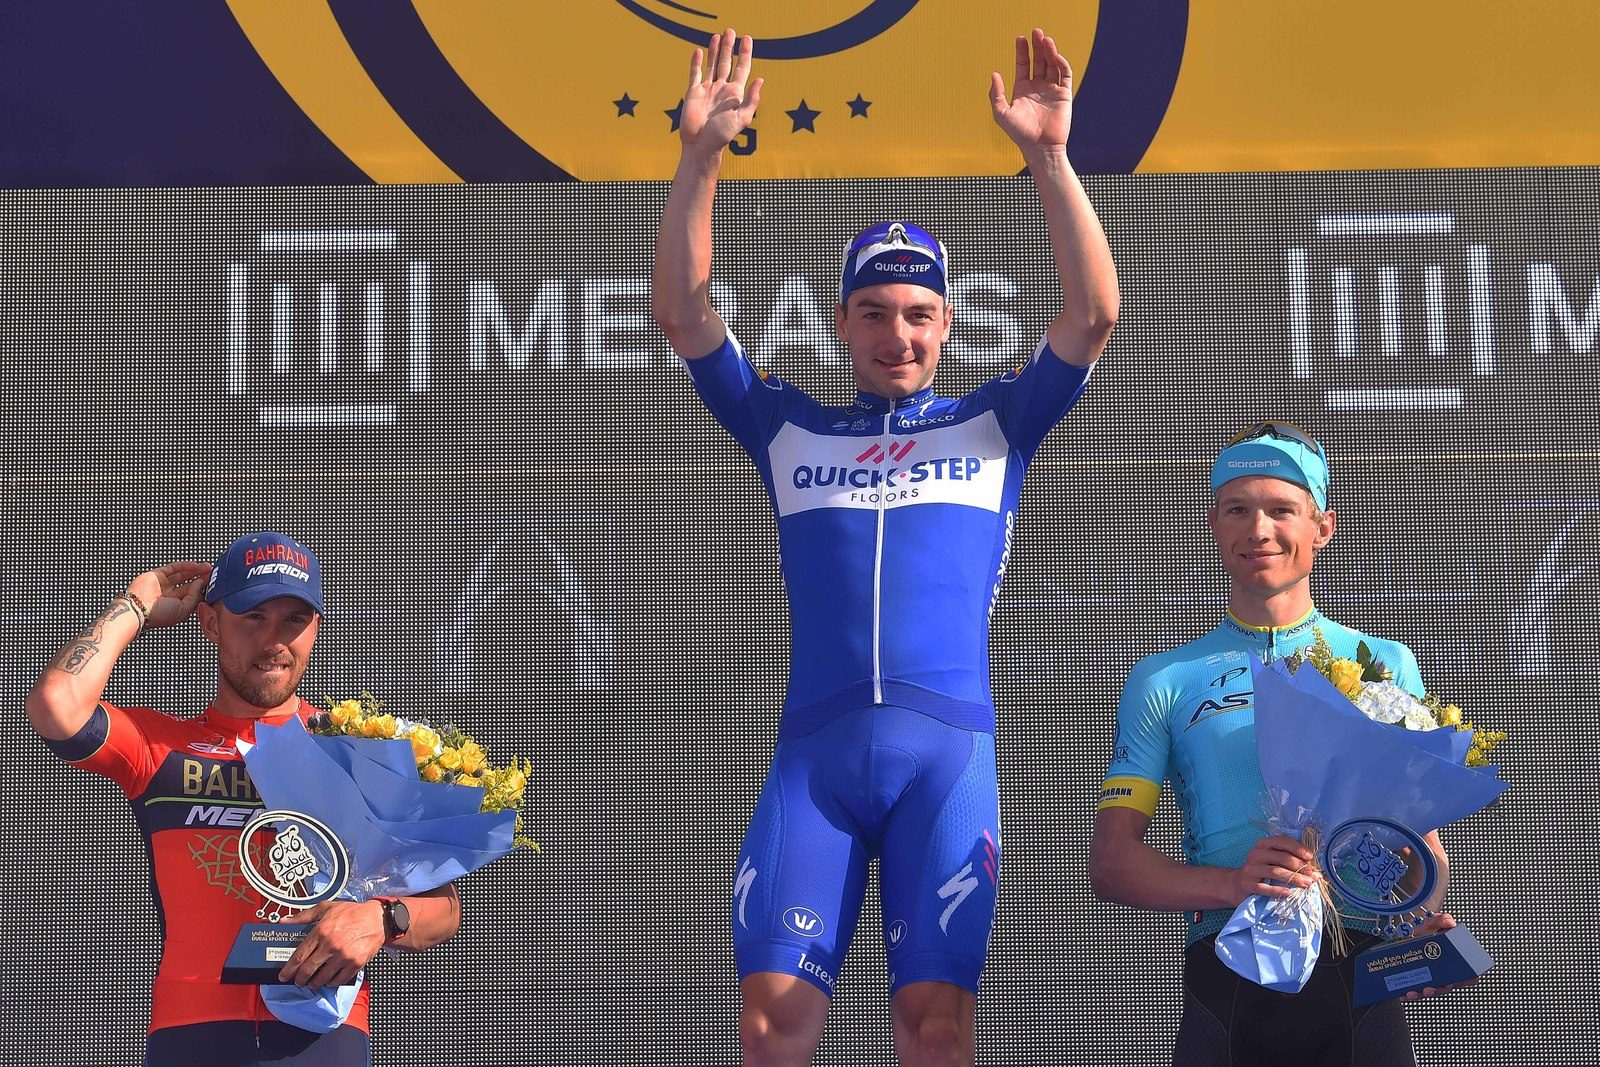 Элиа Вивиани выиграл велогонку «Тур Дубая»